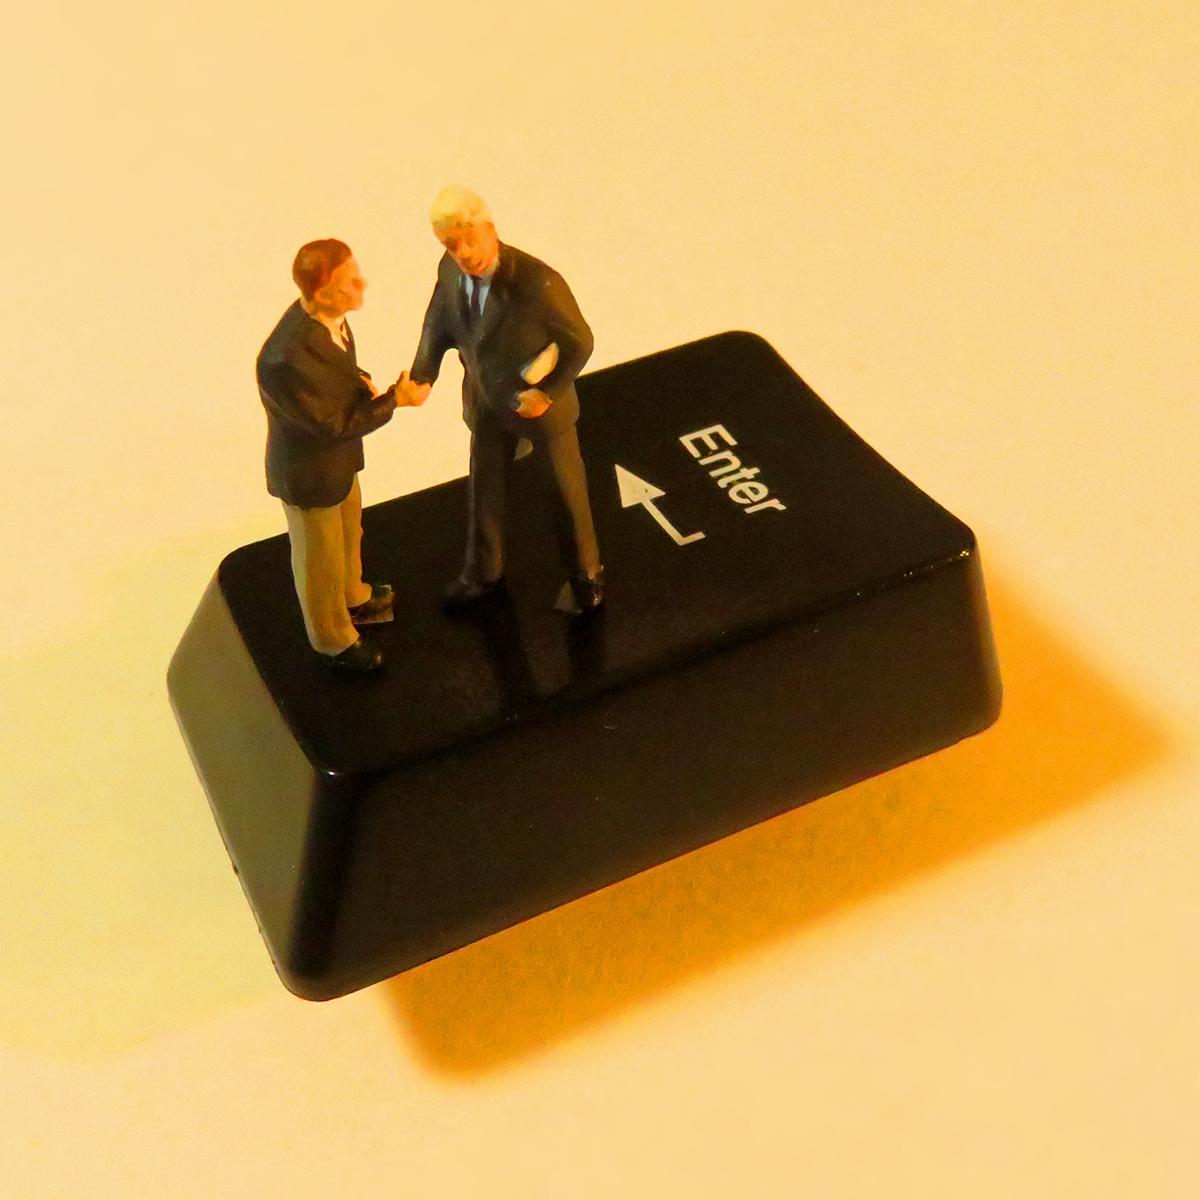 Enterキーで契約が成立して握手を交わすビジネスマン